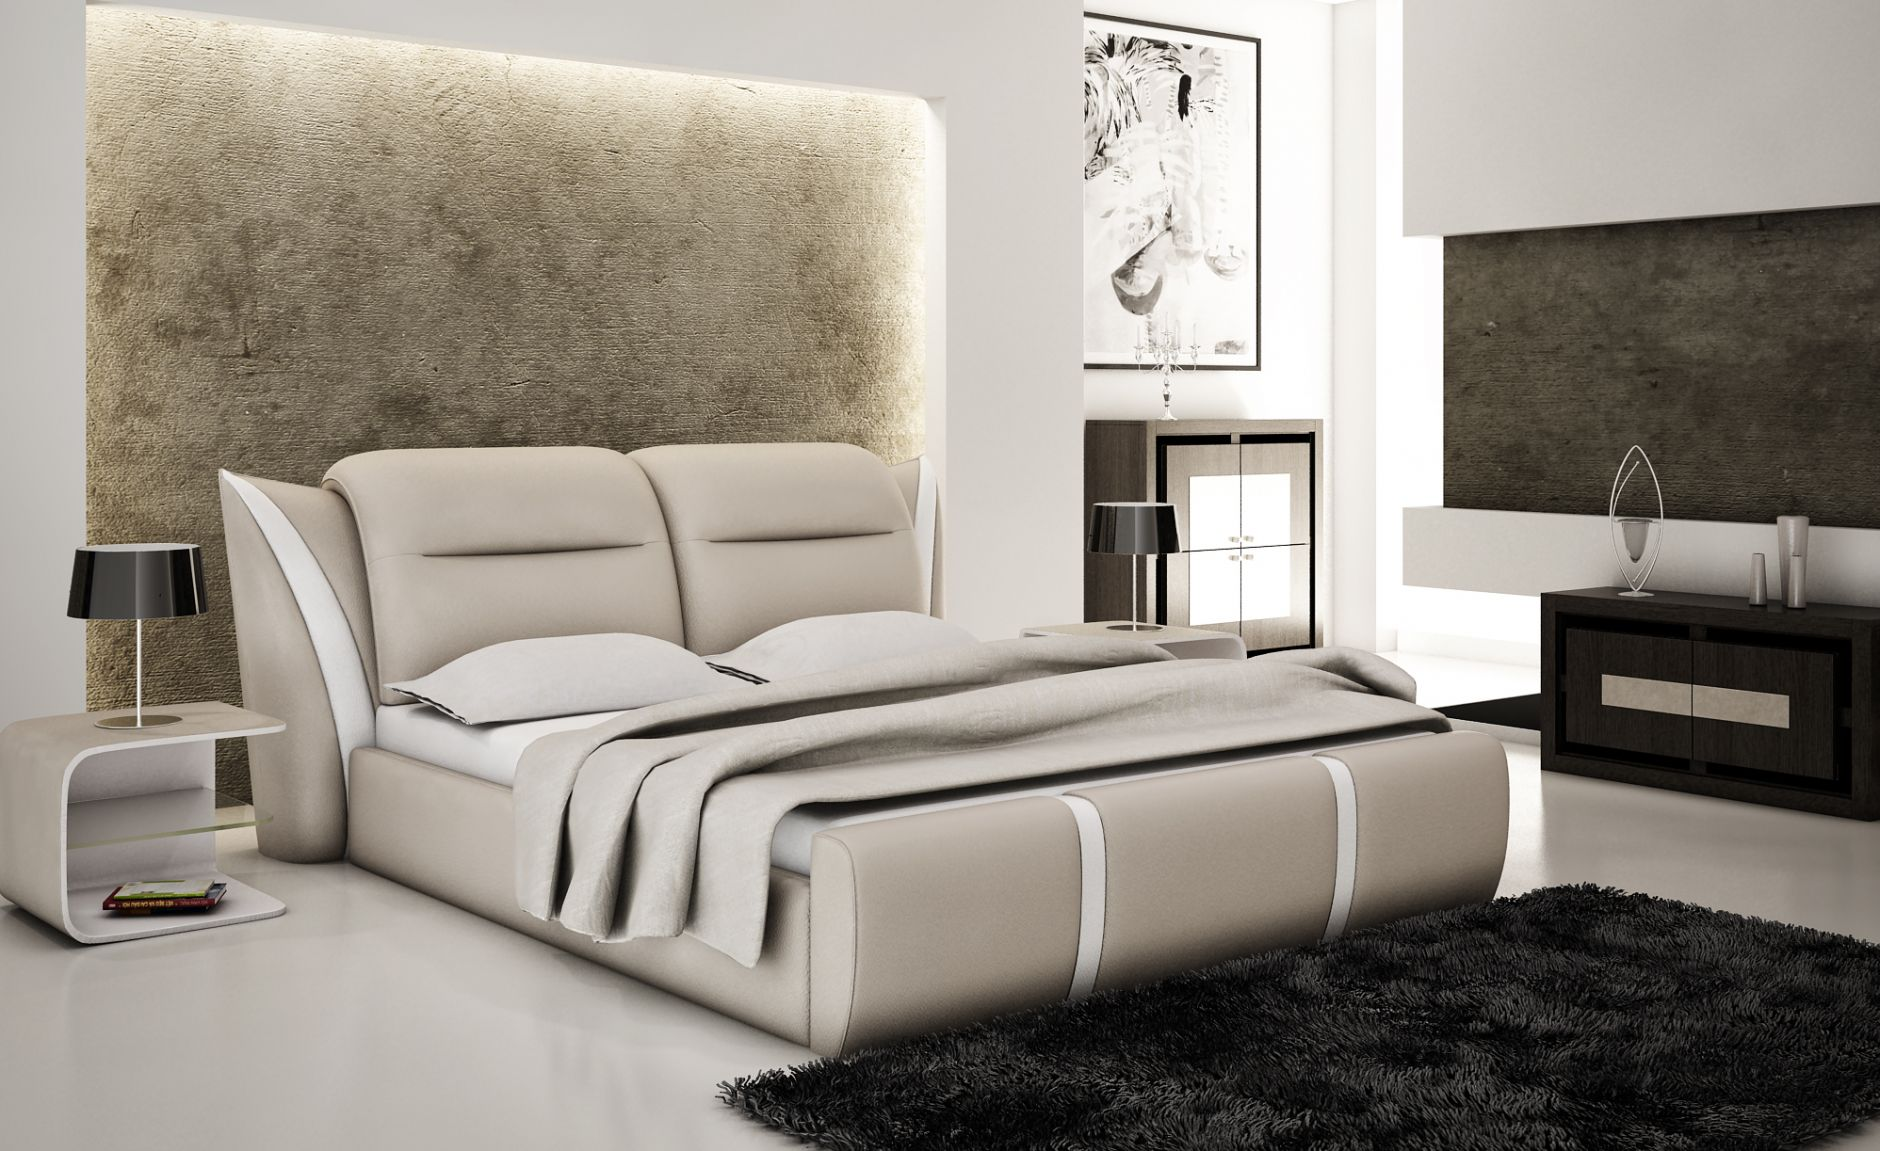 Modele chambre a coucher for Exemple de chambre a coucher